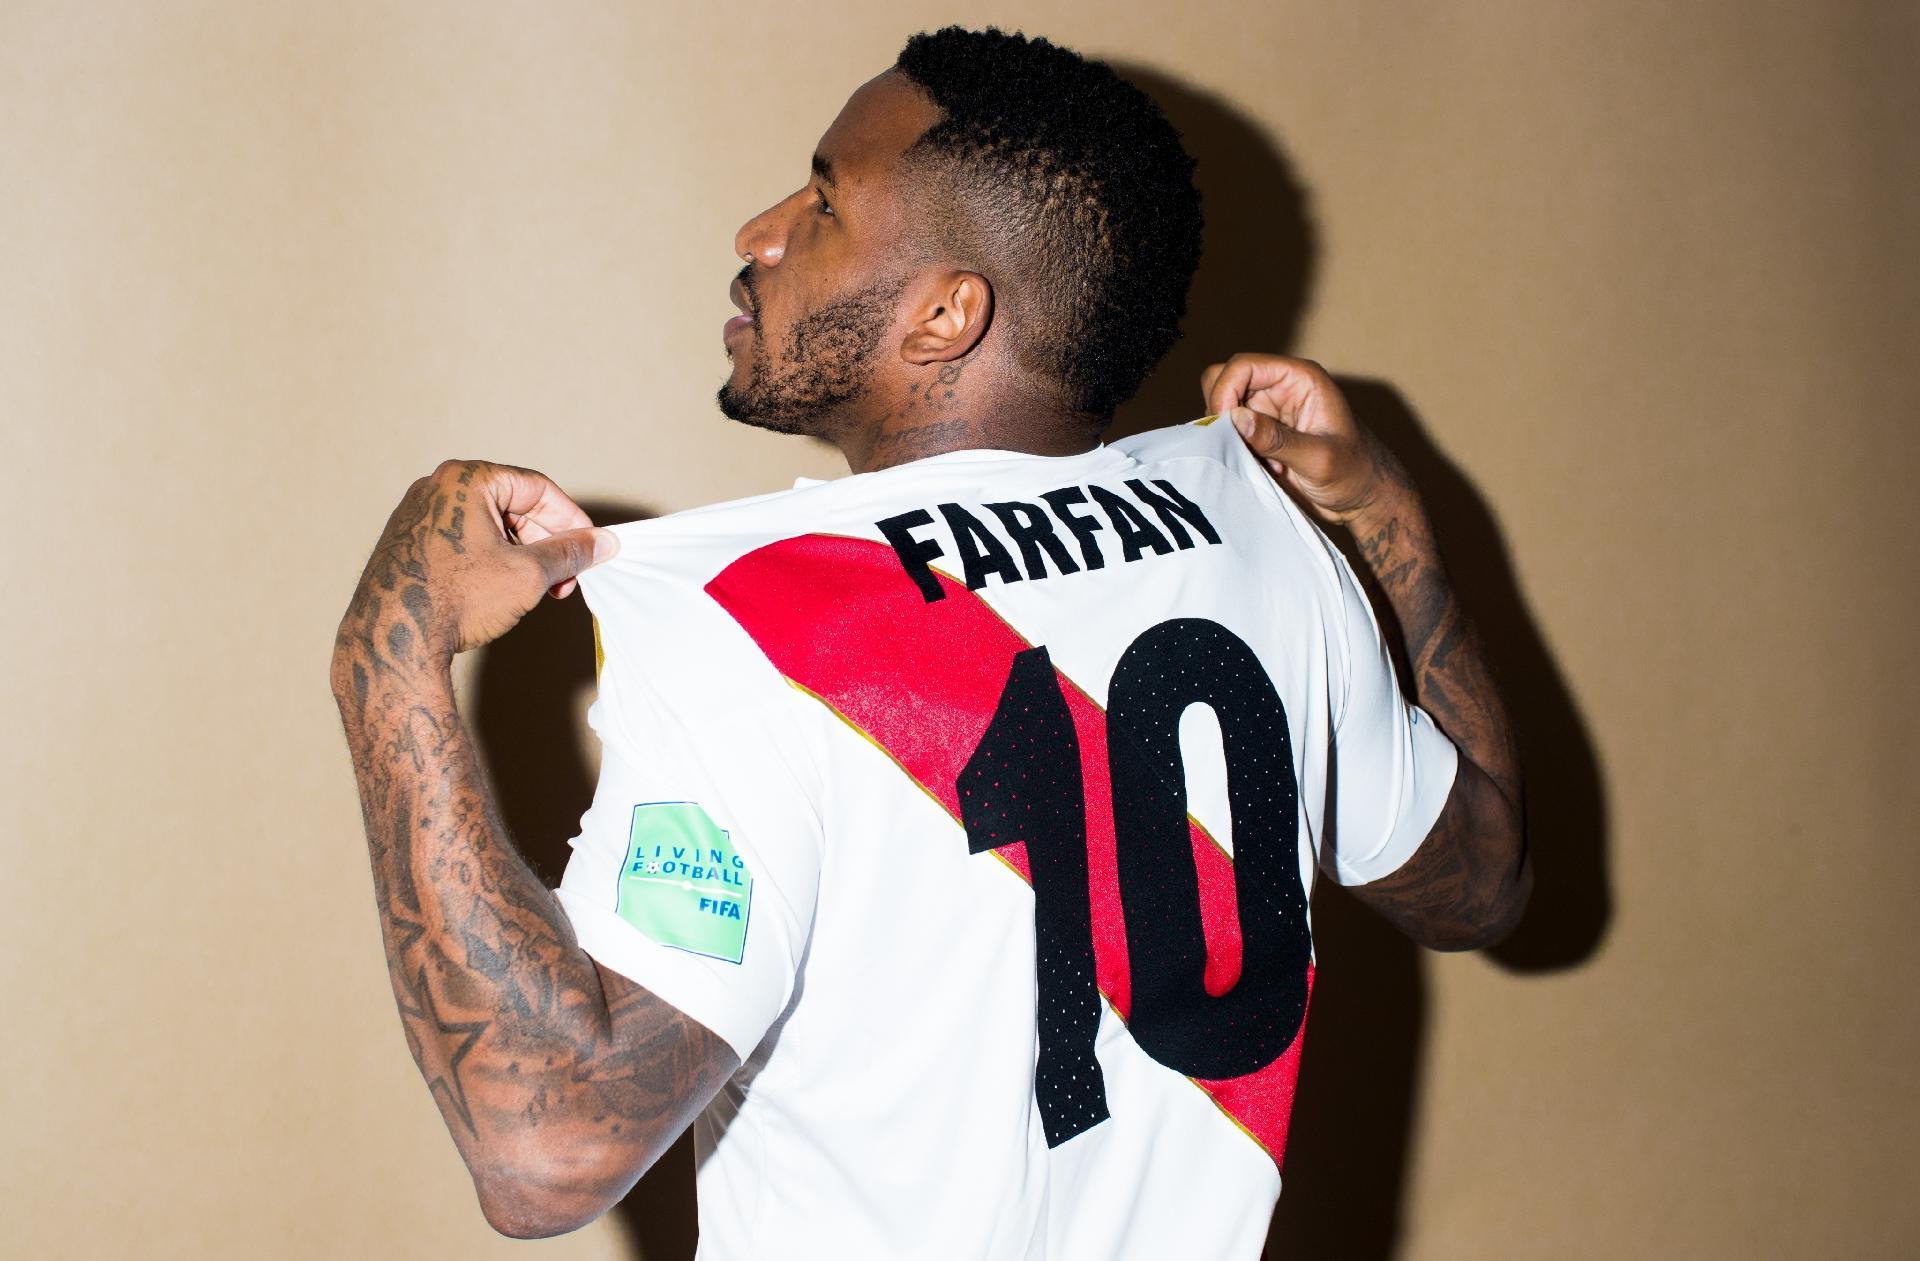 Peru na Copa 2018  À sombra de Guerrero acf3f6dafe4b7